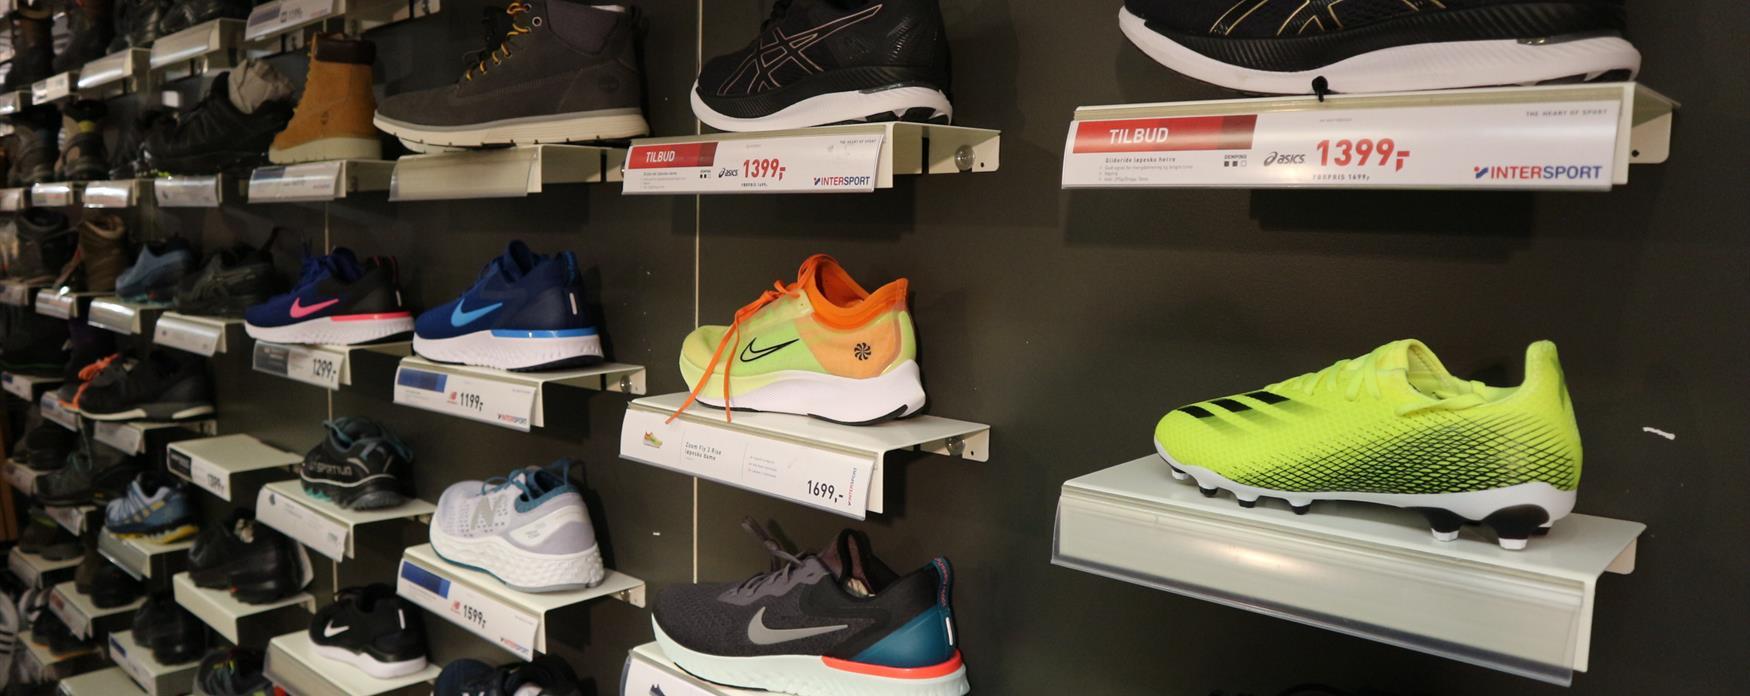 Sko i butikk